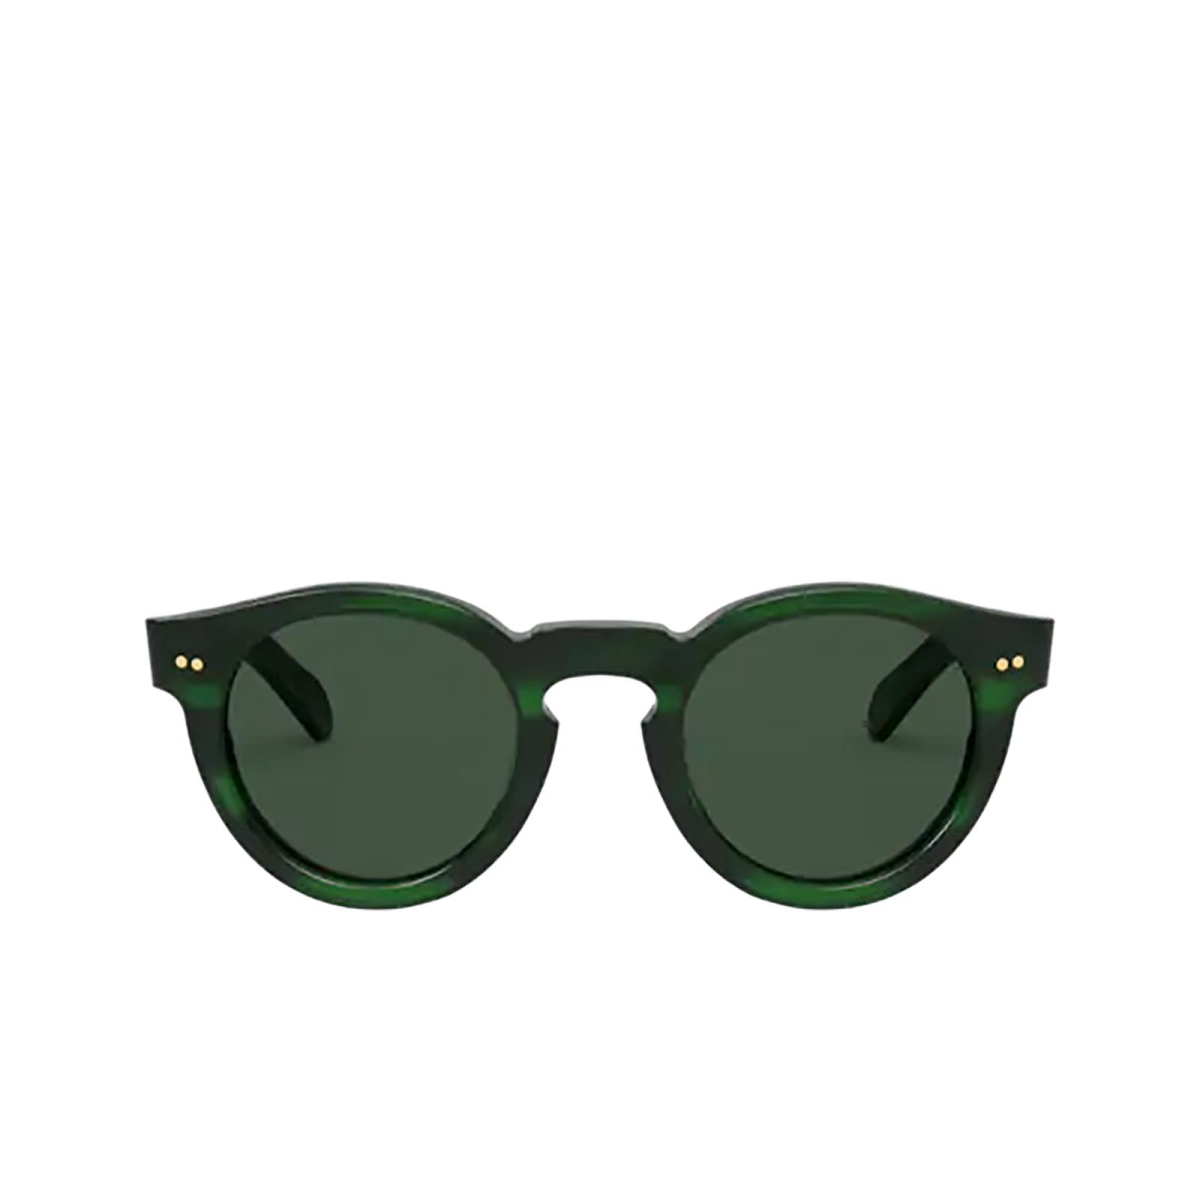 Polo Ralph Lauren® Round Sunglasses: PH4165 color Shiny Green Havana 512571.